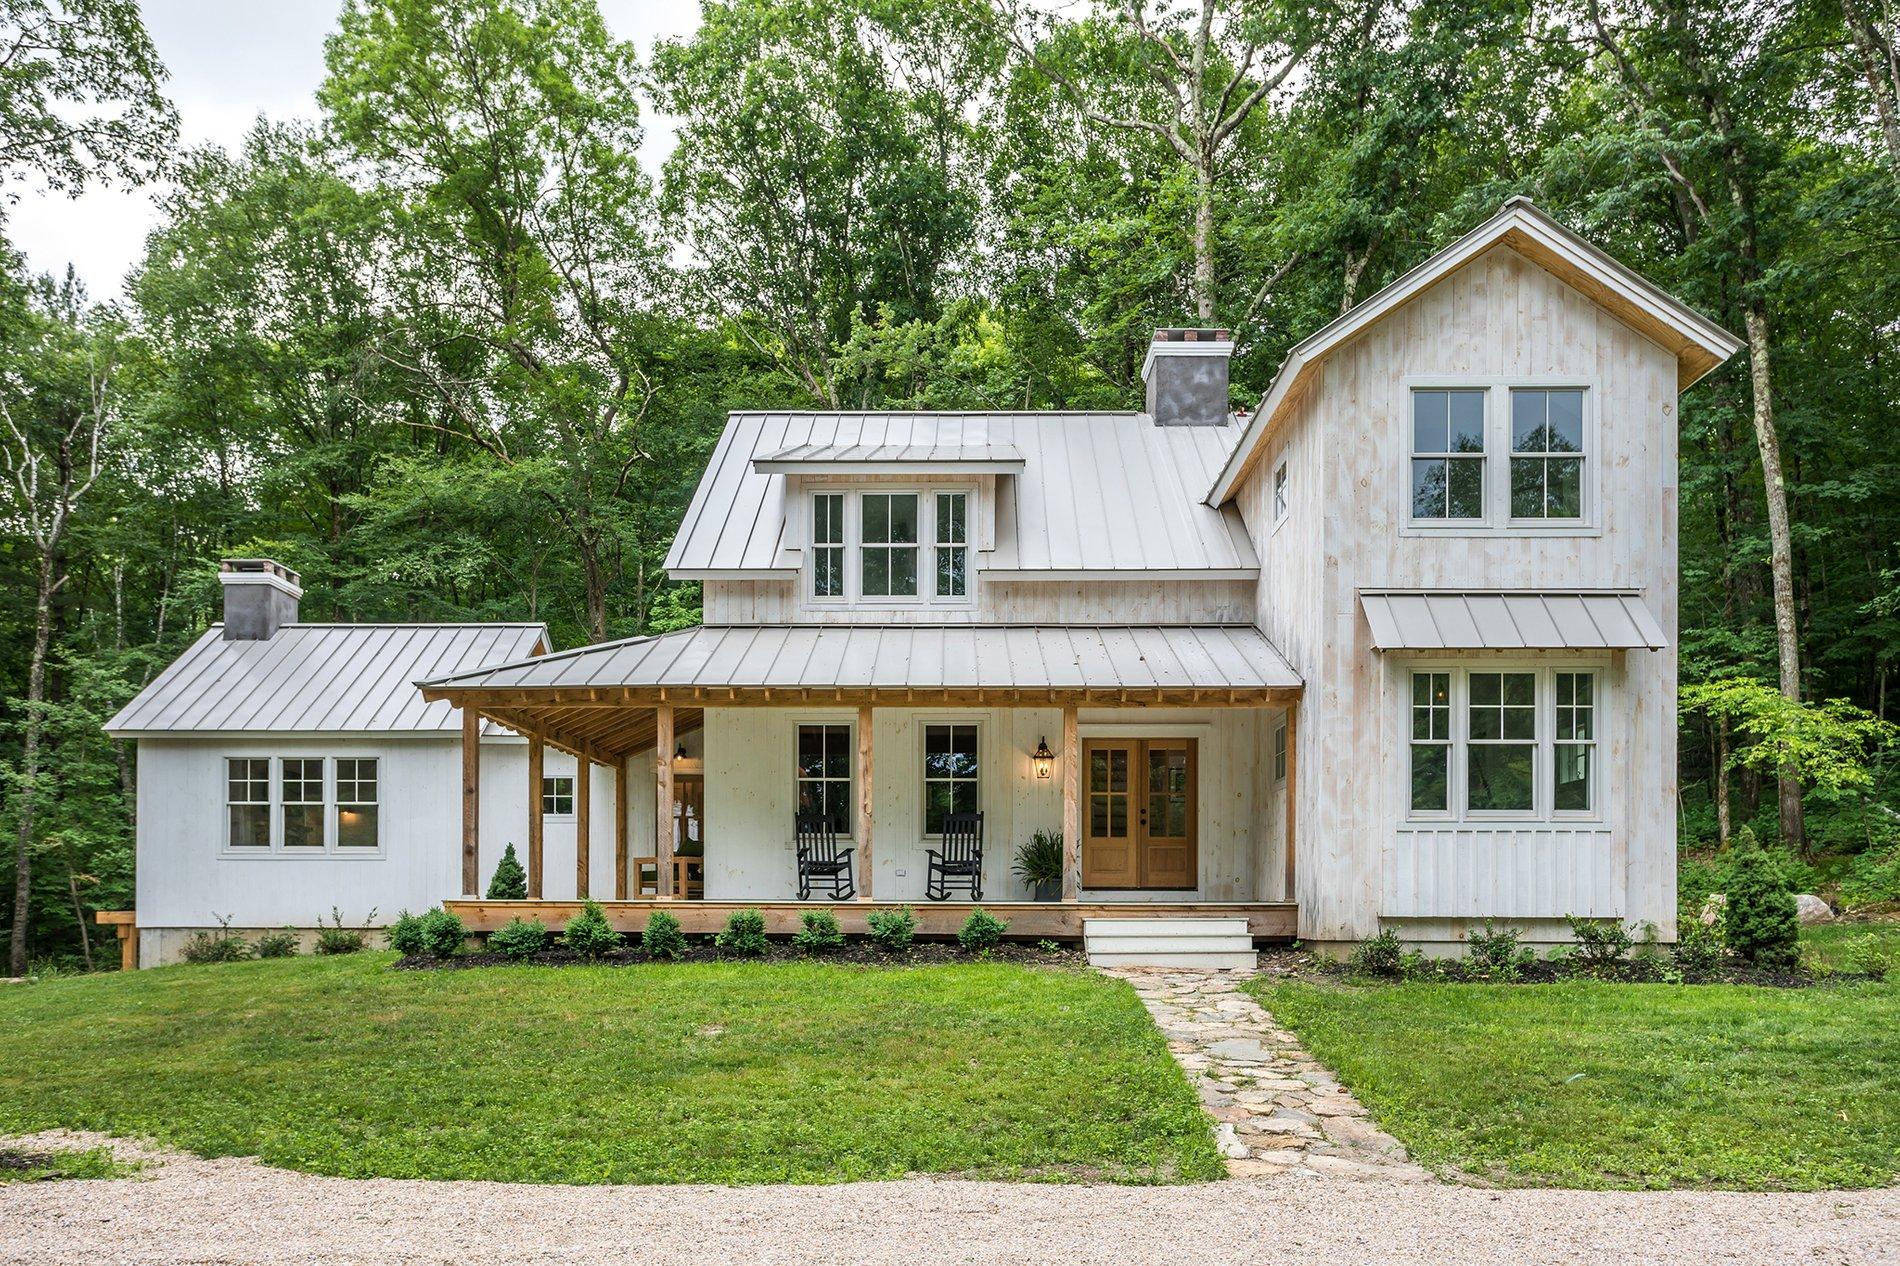 Beautiful custom farmhouse with whitewashed siding and real wood.